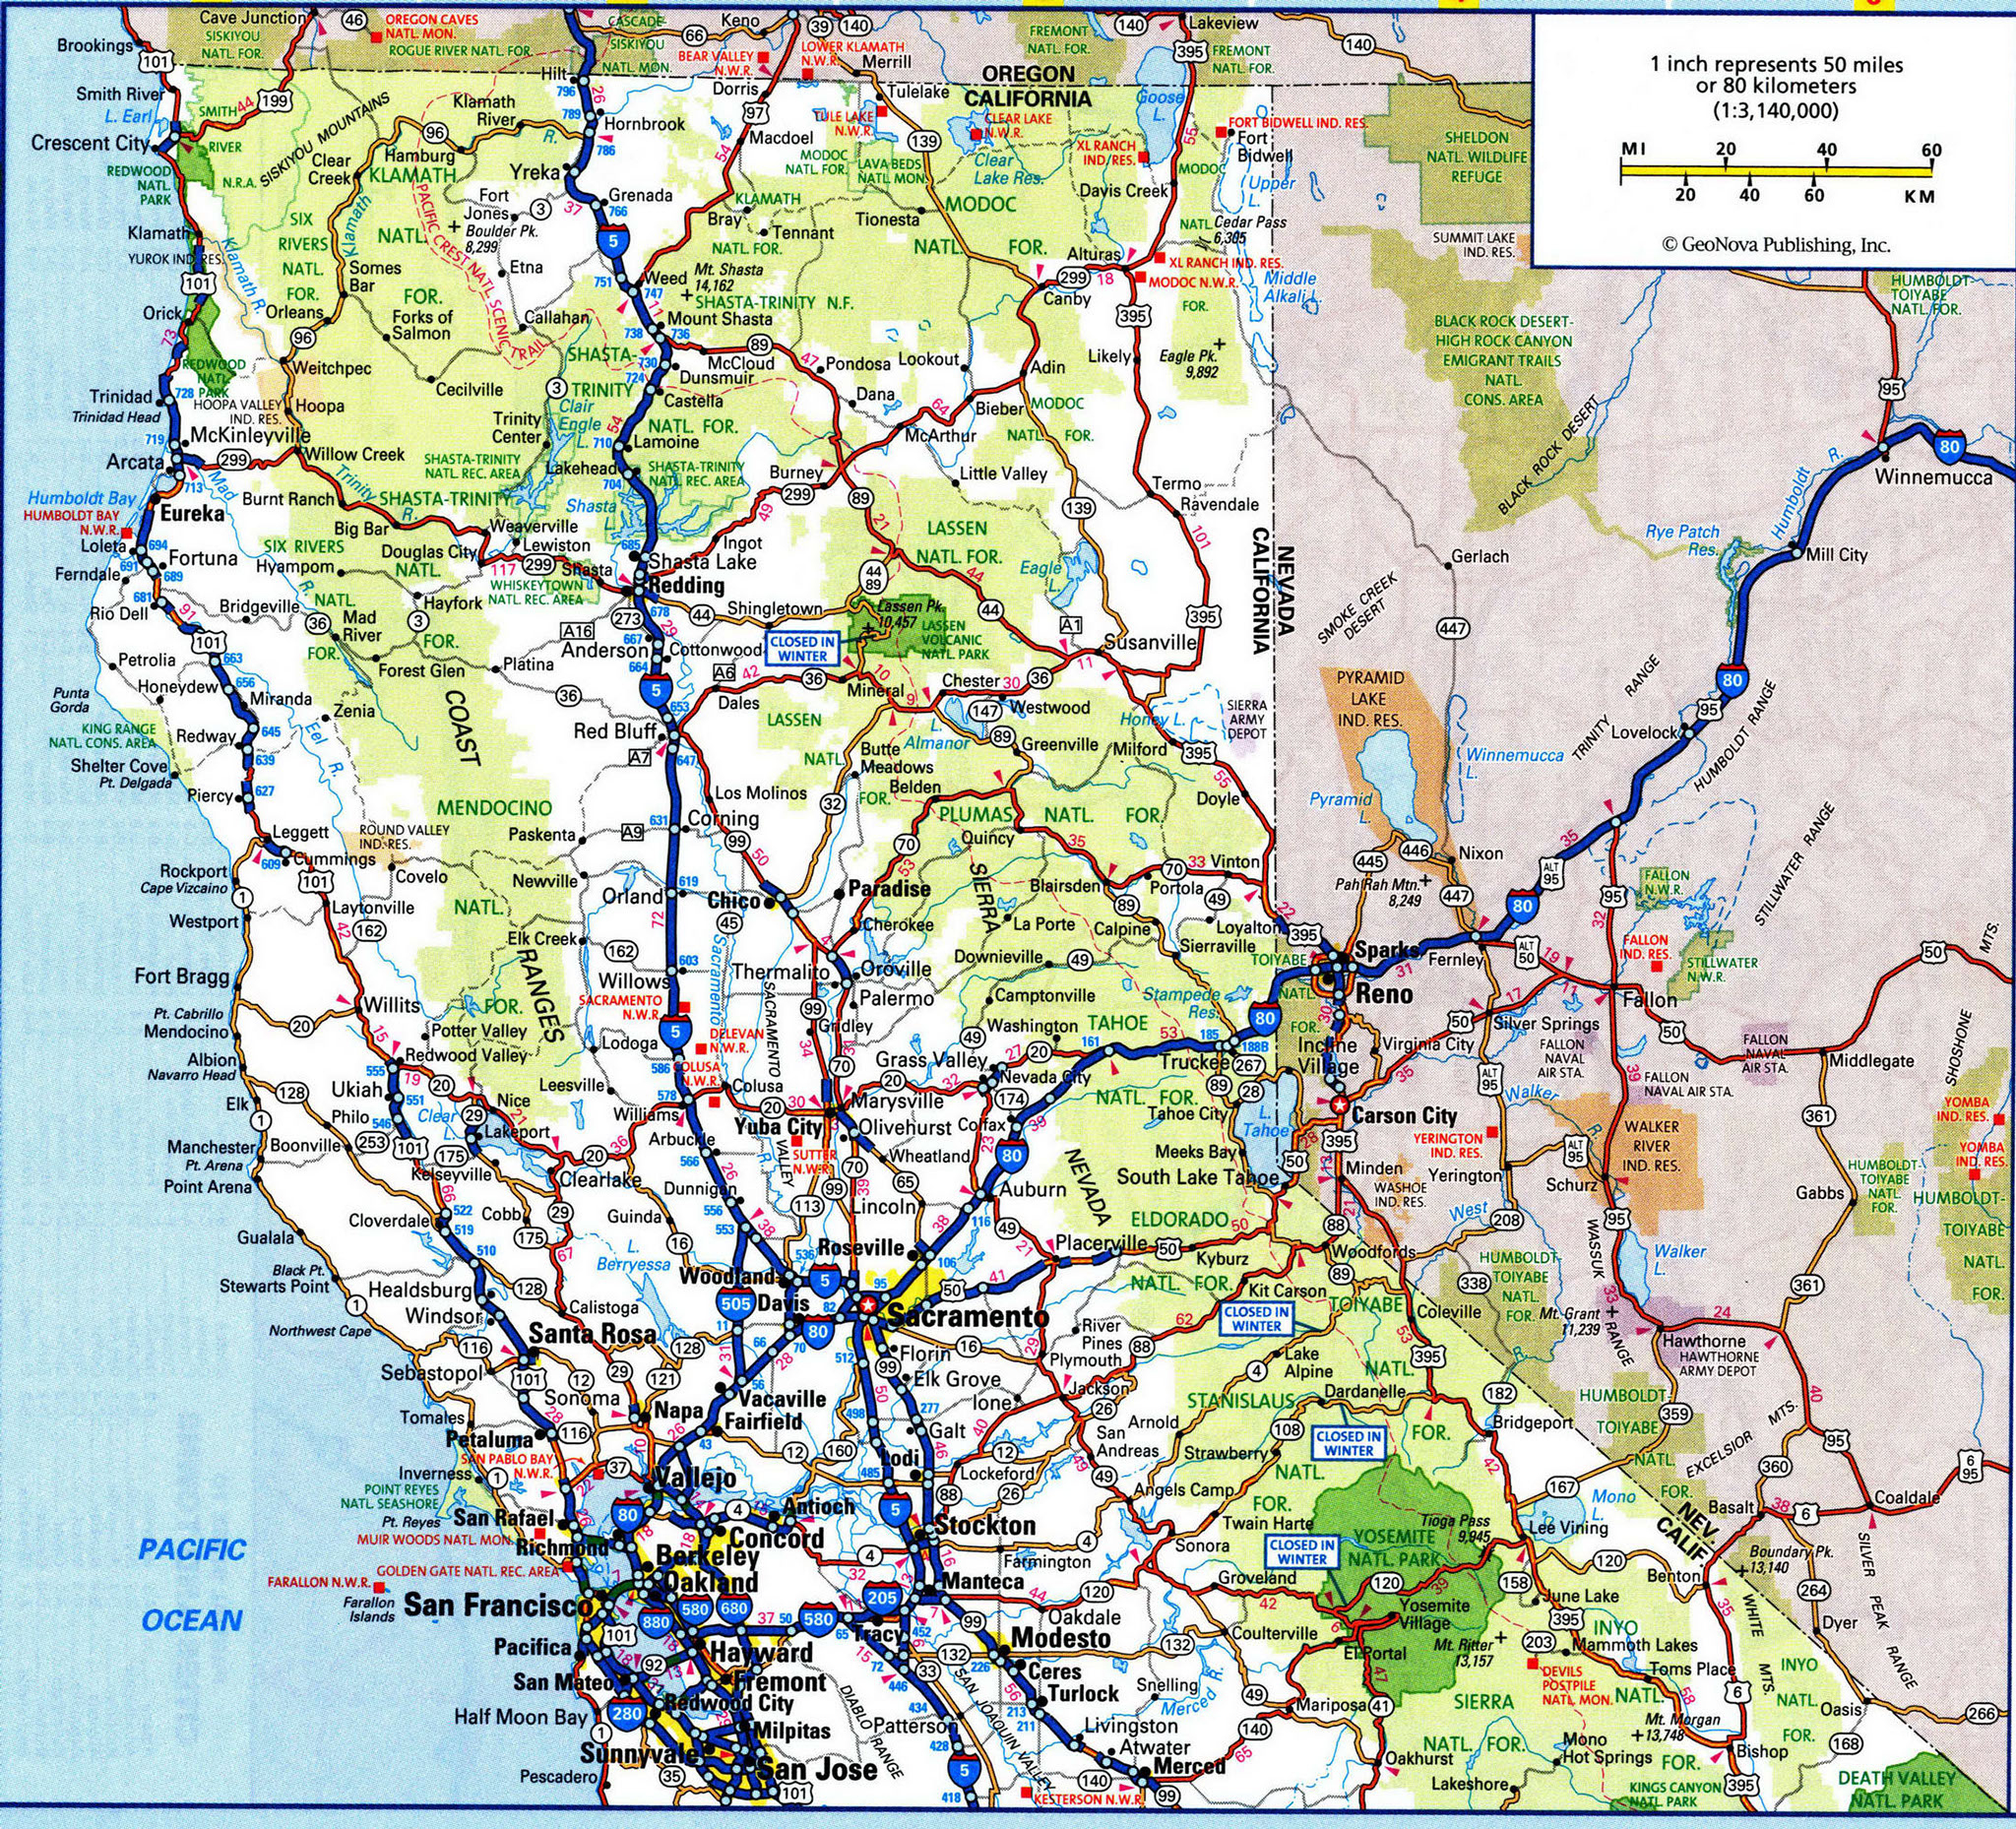 Map Of North California California River Map Northern California - Northern California Highway Map